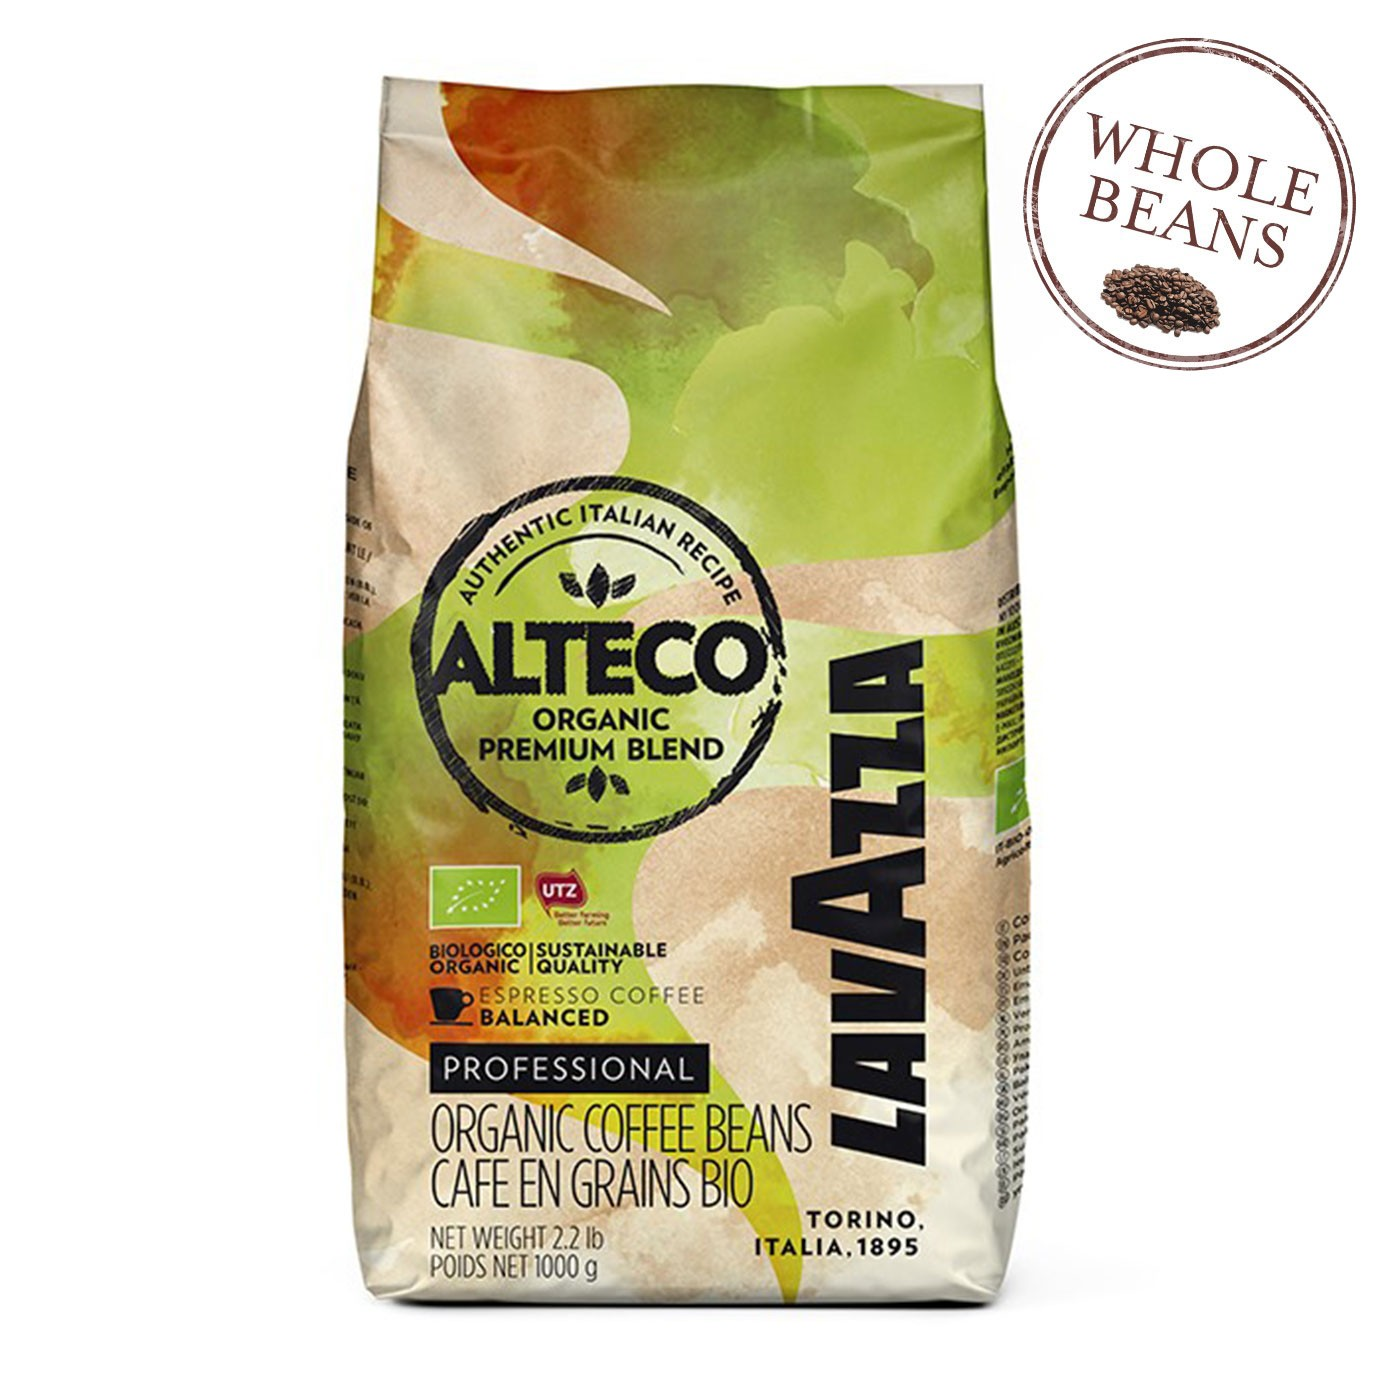 Organic Alteco Espresso Whole Beans 35.2 oz - Lavazza | Eataly.com